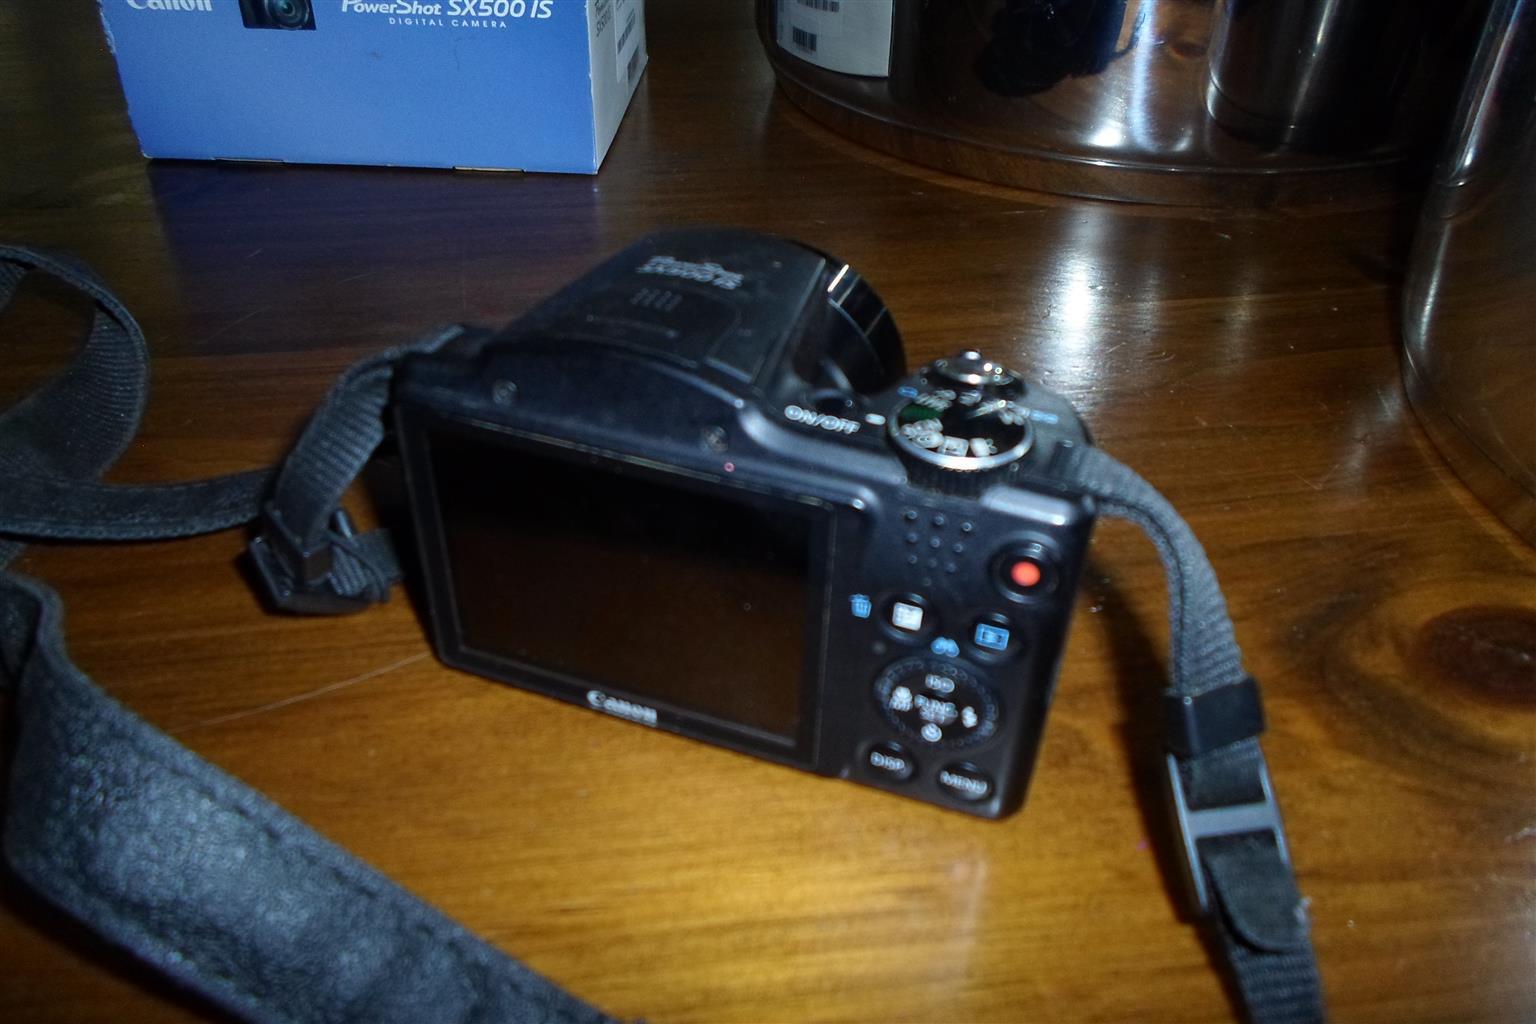 Canon Powershot SX500 IS Camera